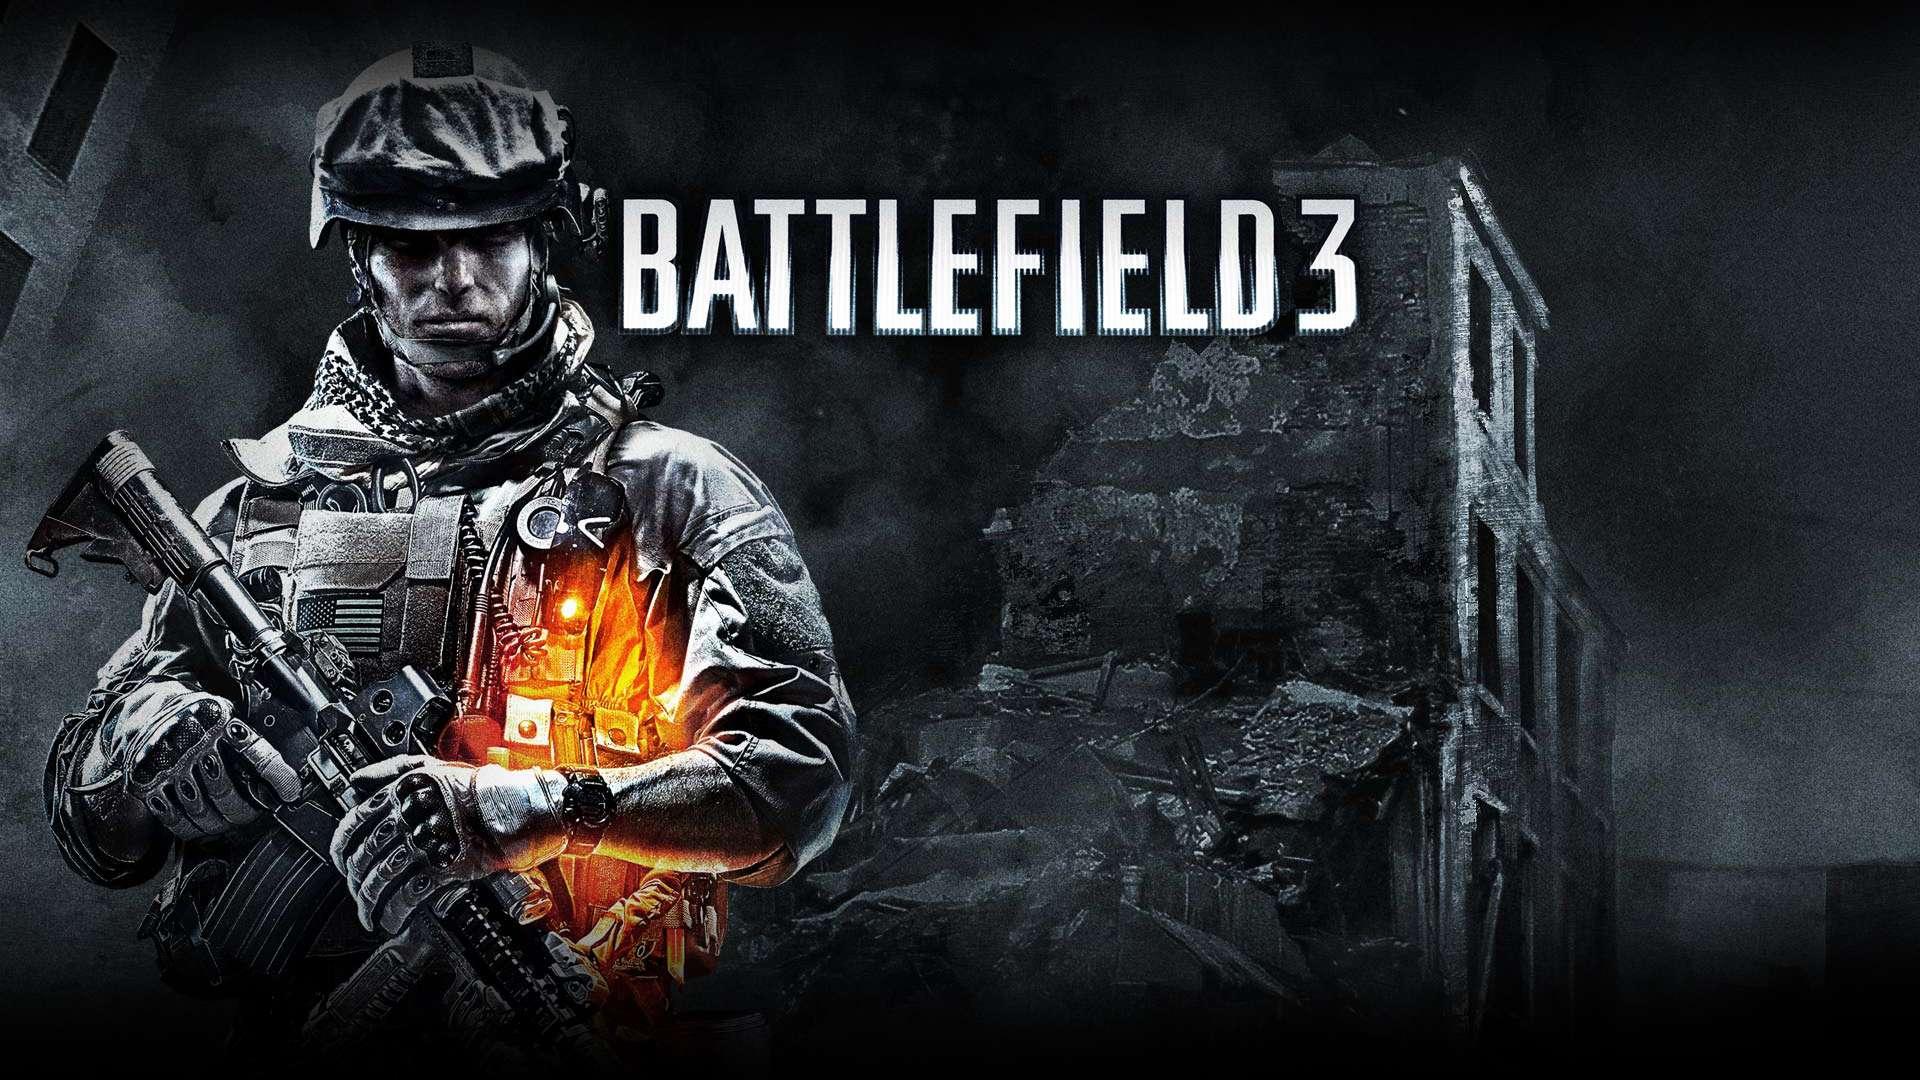 Battlefield 3 wallpapers hd gaming phanatic